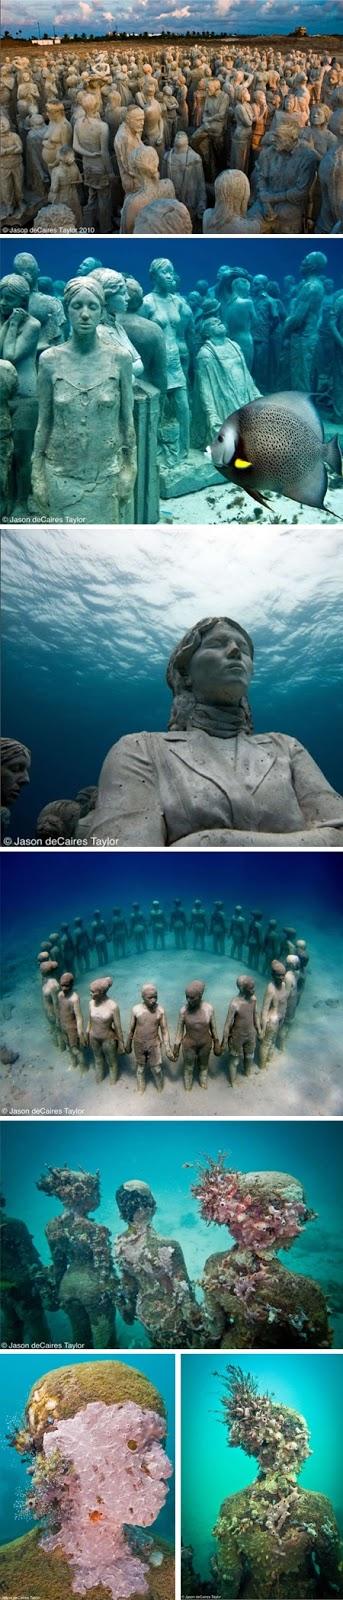 Underground Museum,Cancun,Mexico